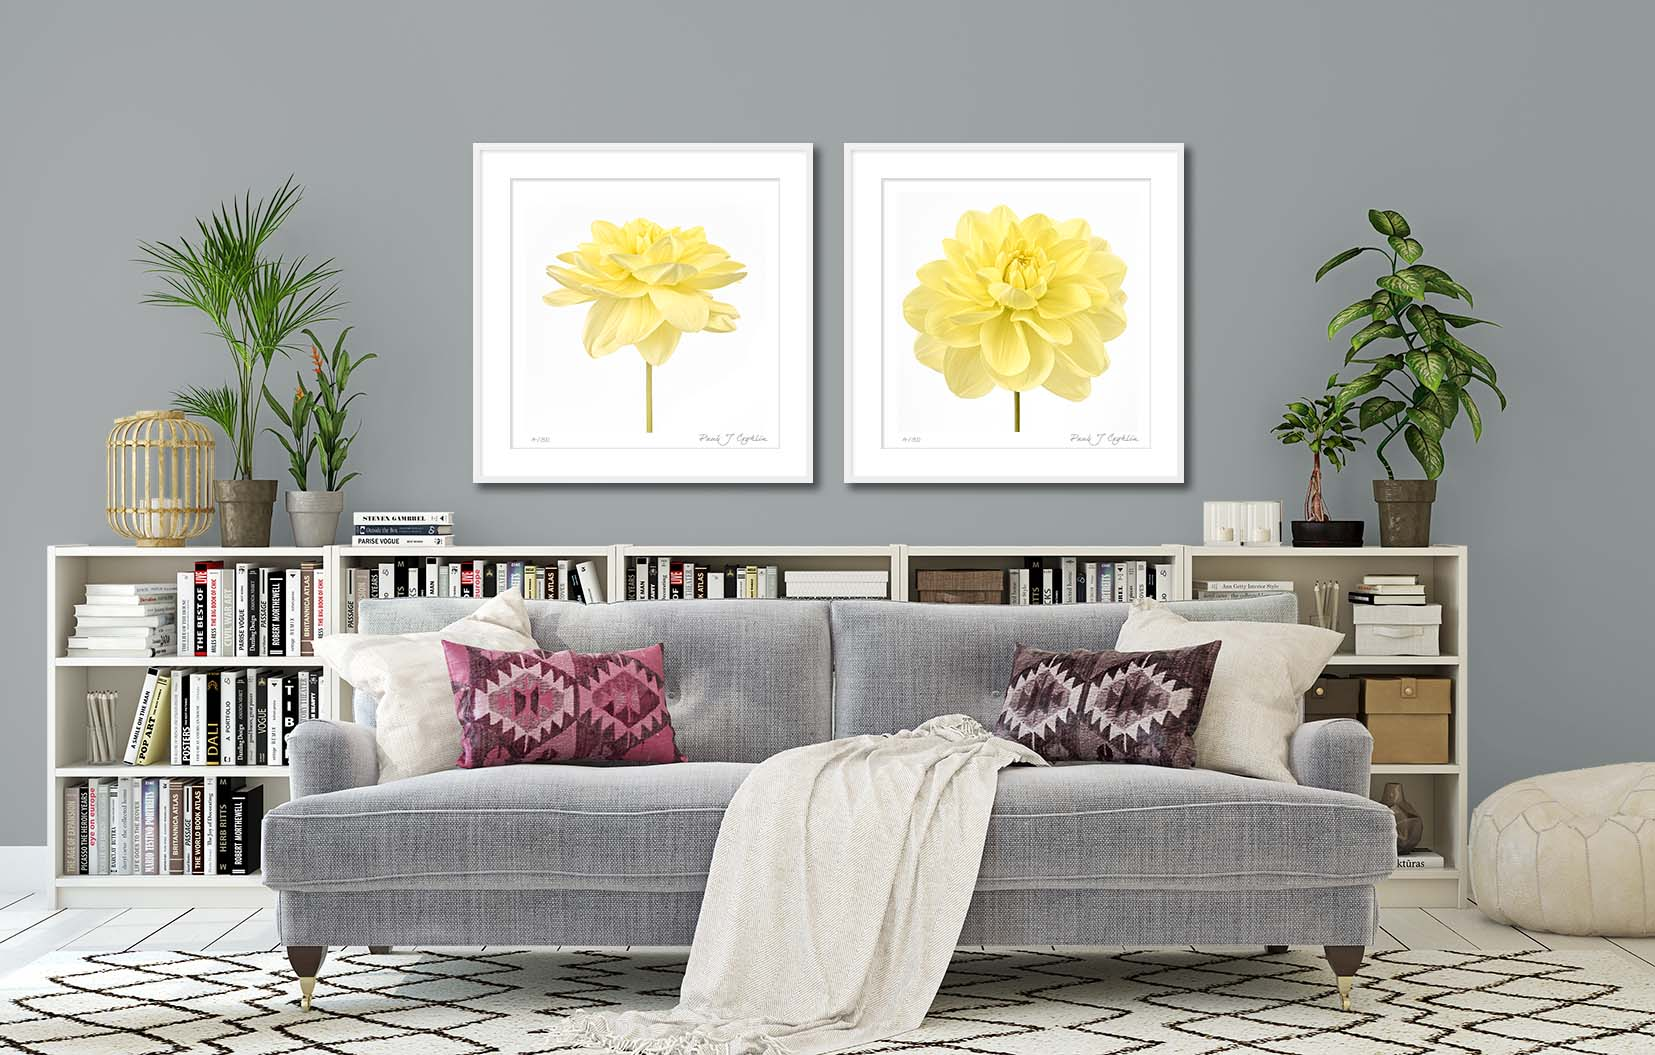 Dahlia 'Glorie van Heemstede' I + II. Limited edition botanical prints of a yellow dahlia by fine art photographer Paul Coghlin